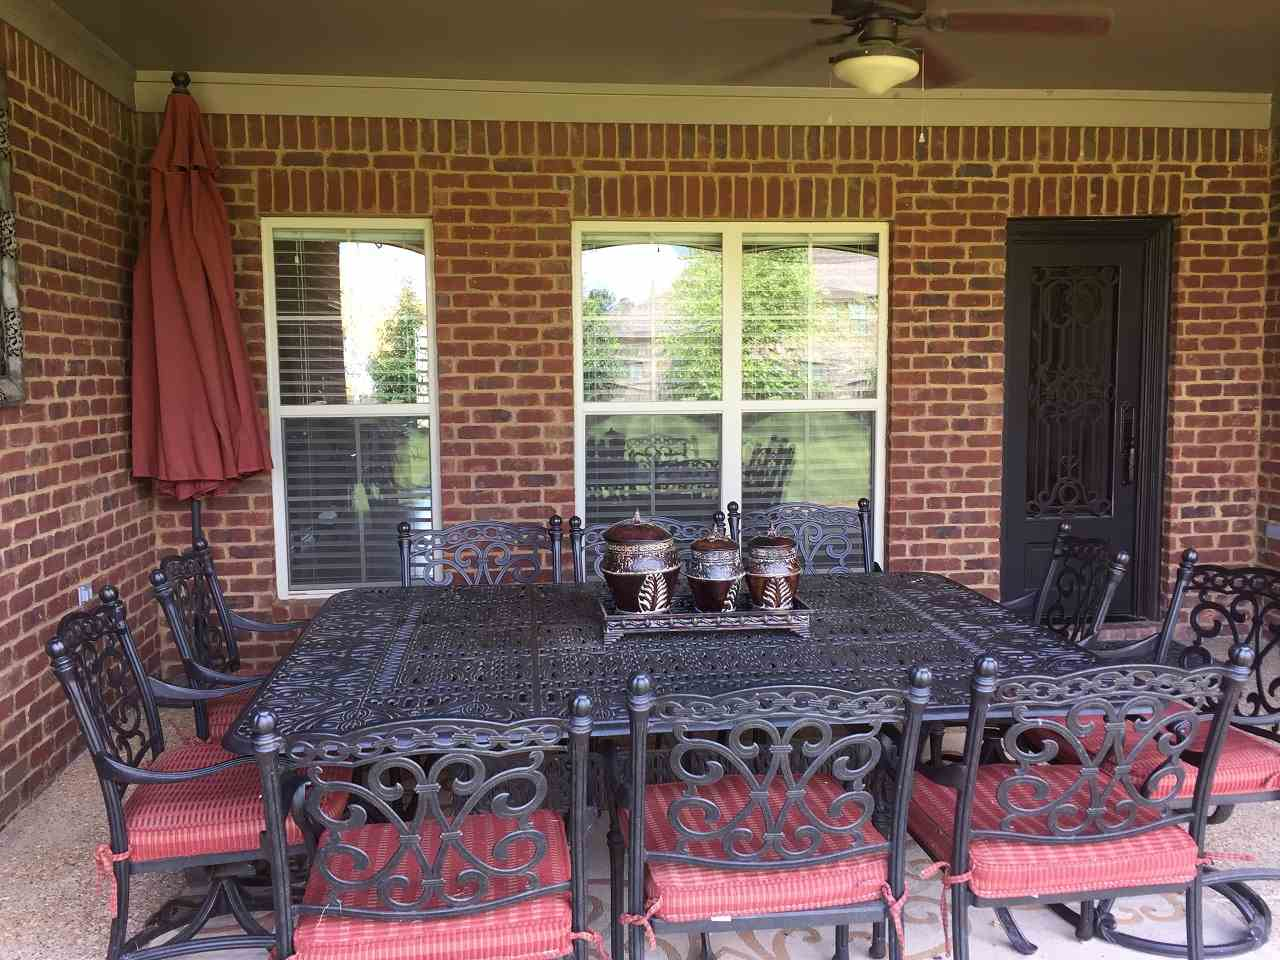 4378 Dawkins Farm Olive Branch, MS 38654 - MLS #: 10007127